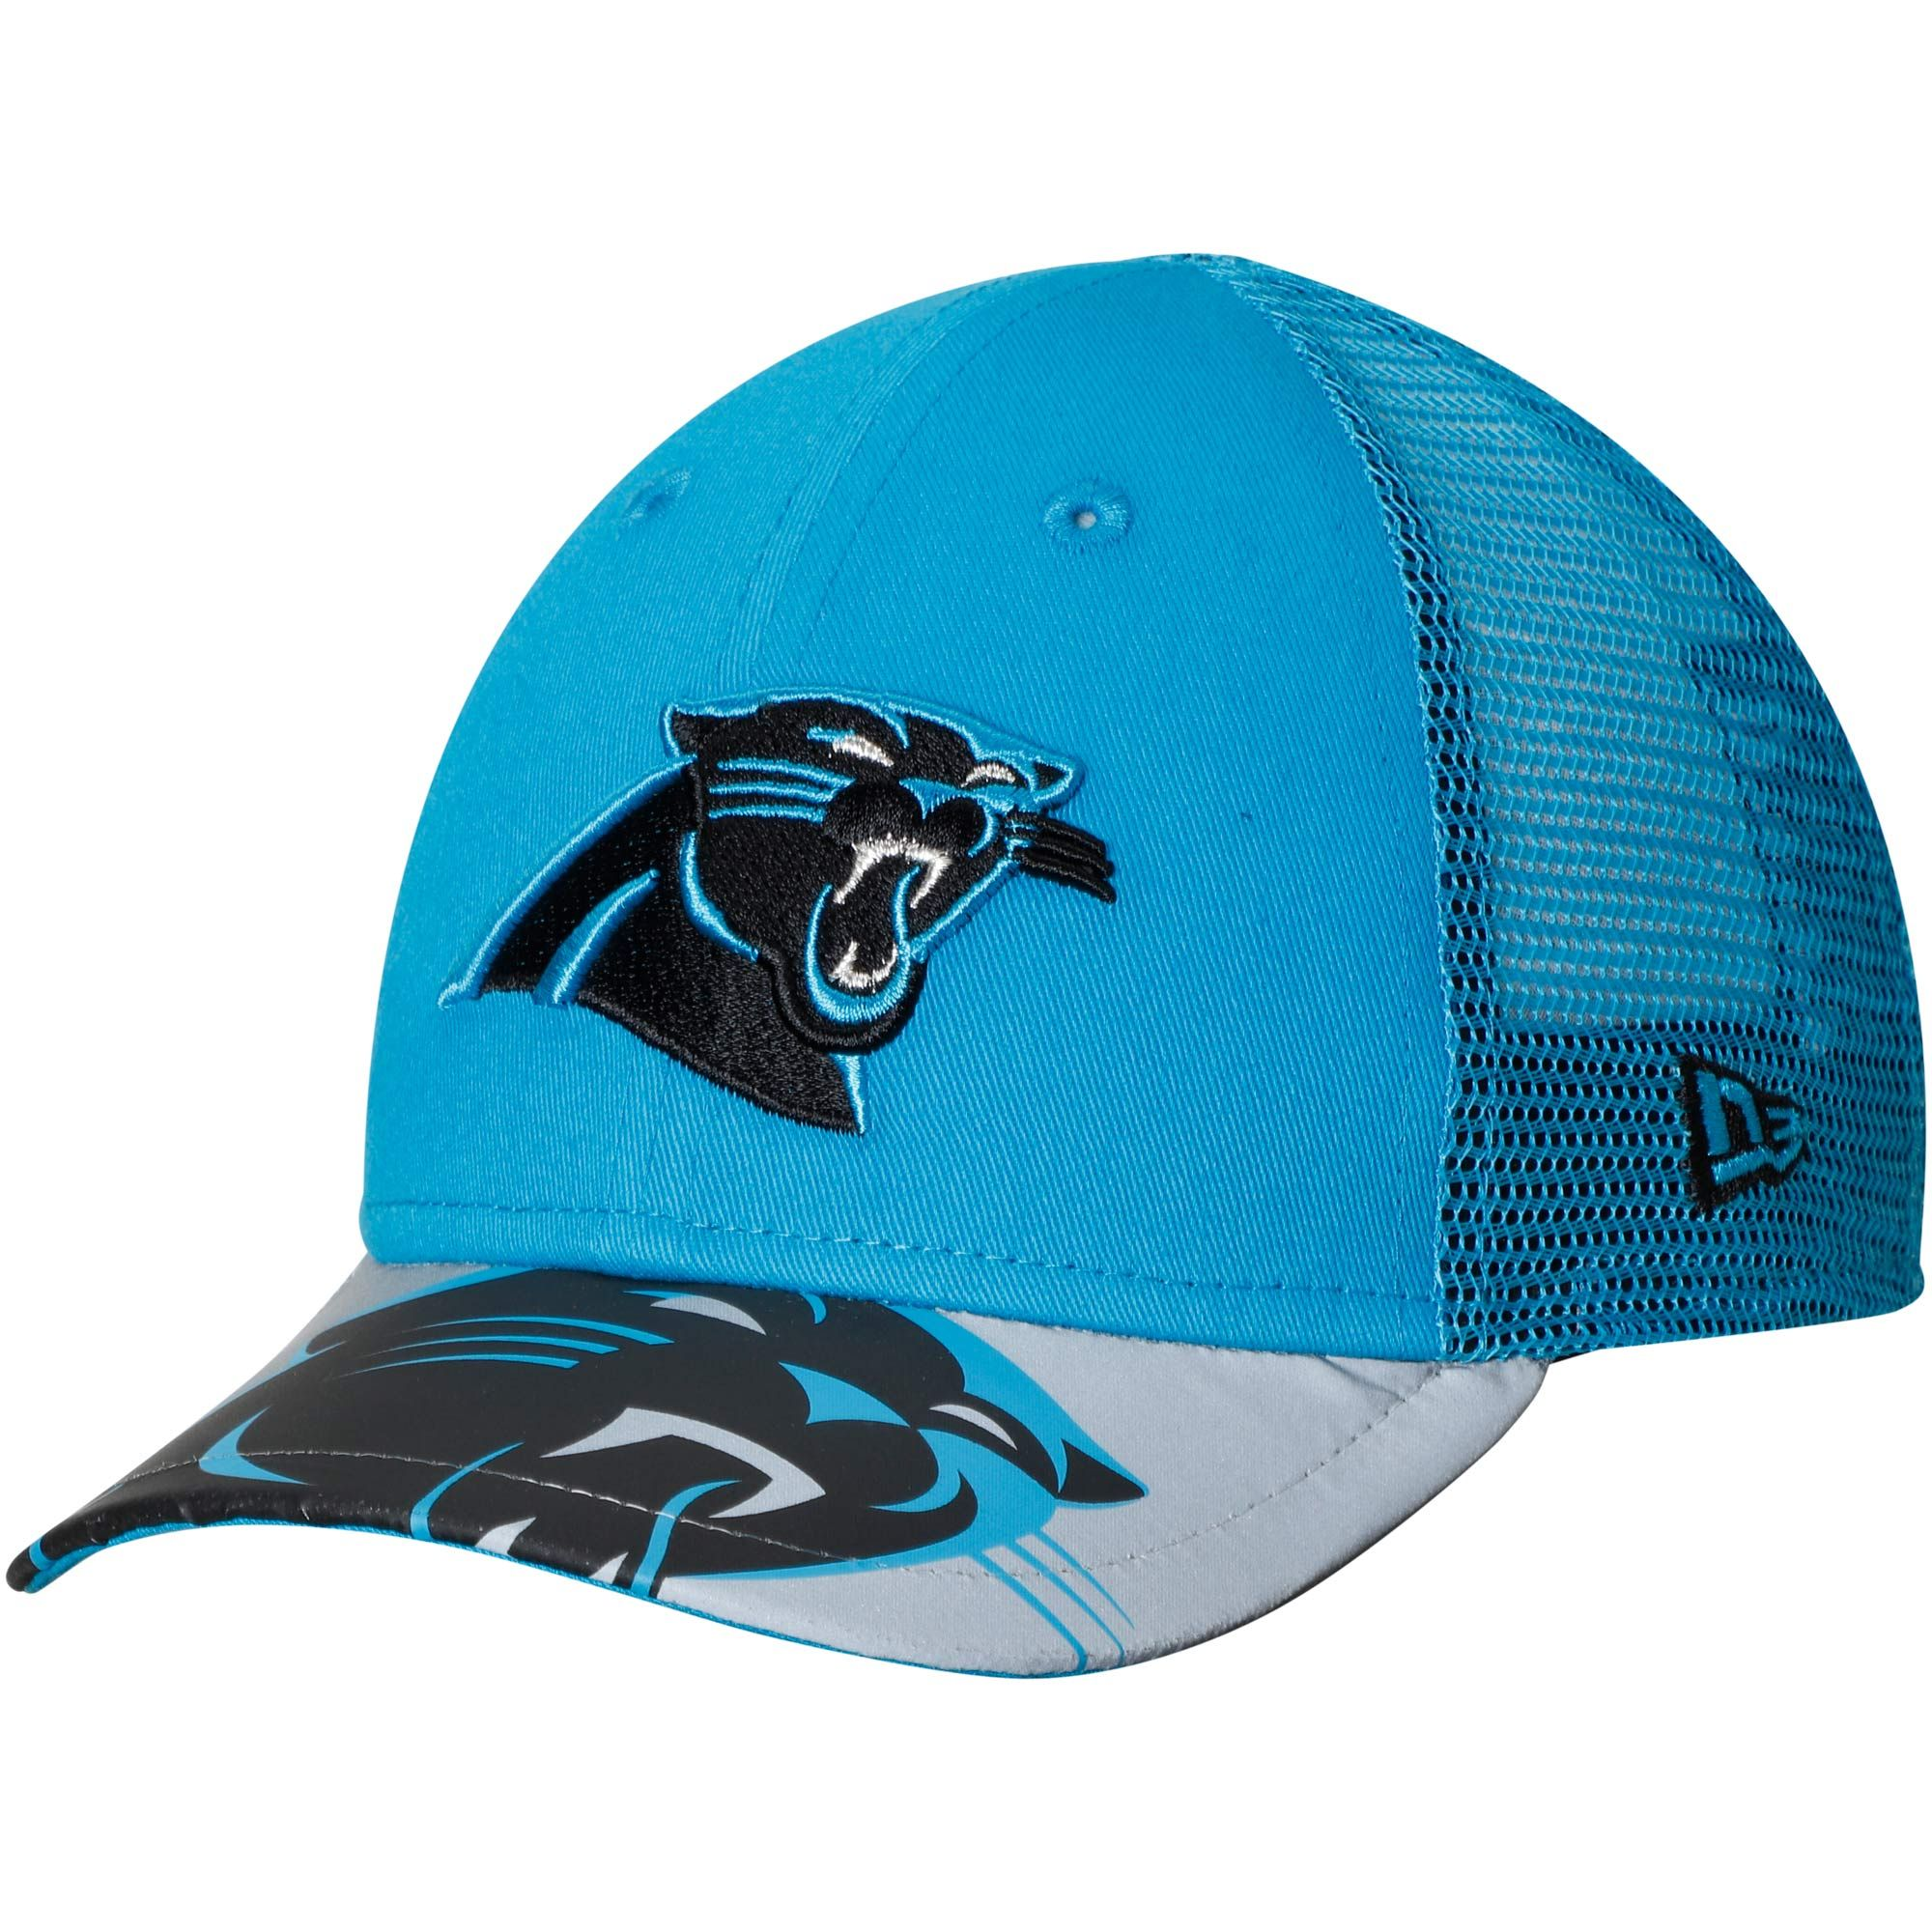 e9a1d23049f New Era Carolina Panthers Toddler Blue Gray Mega Flect 9FORTY Snapback  Adjustable Hat